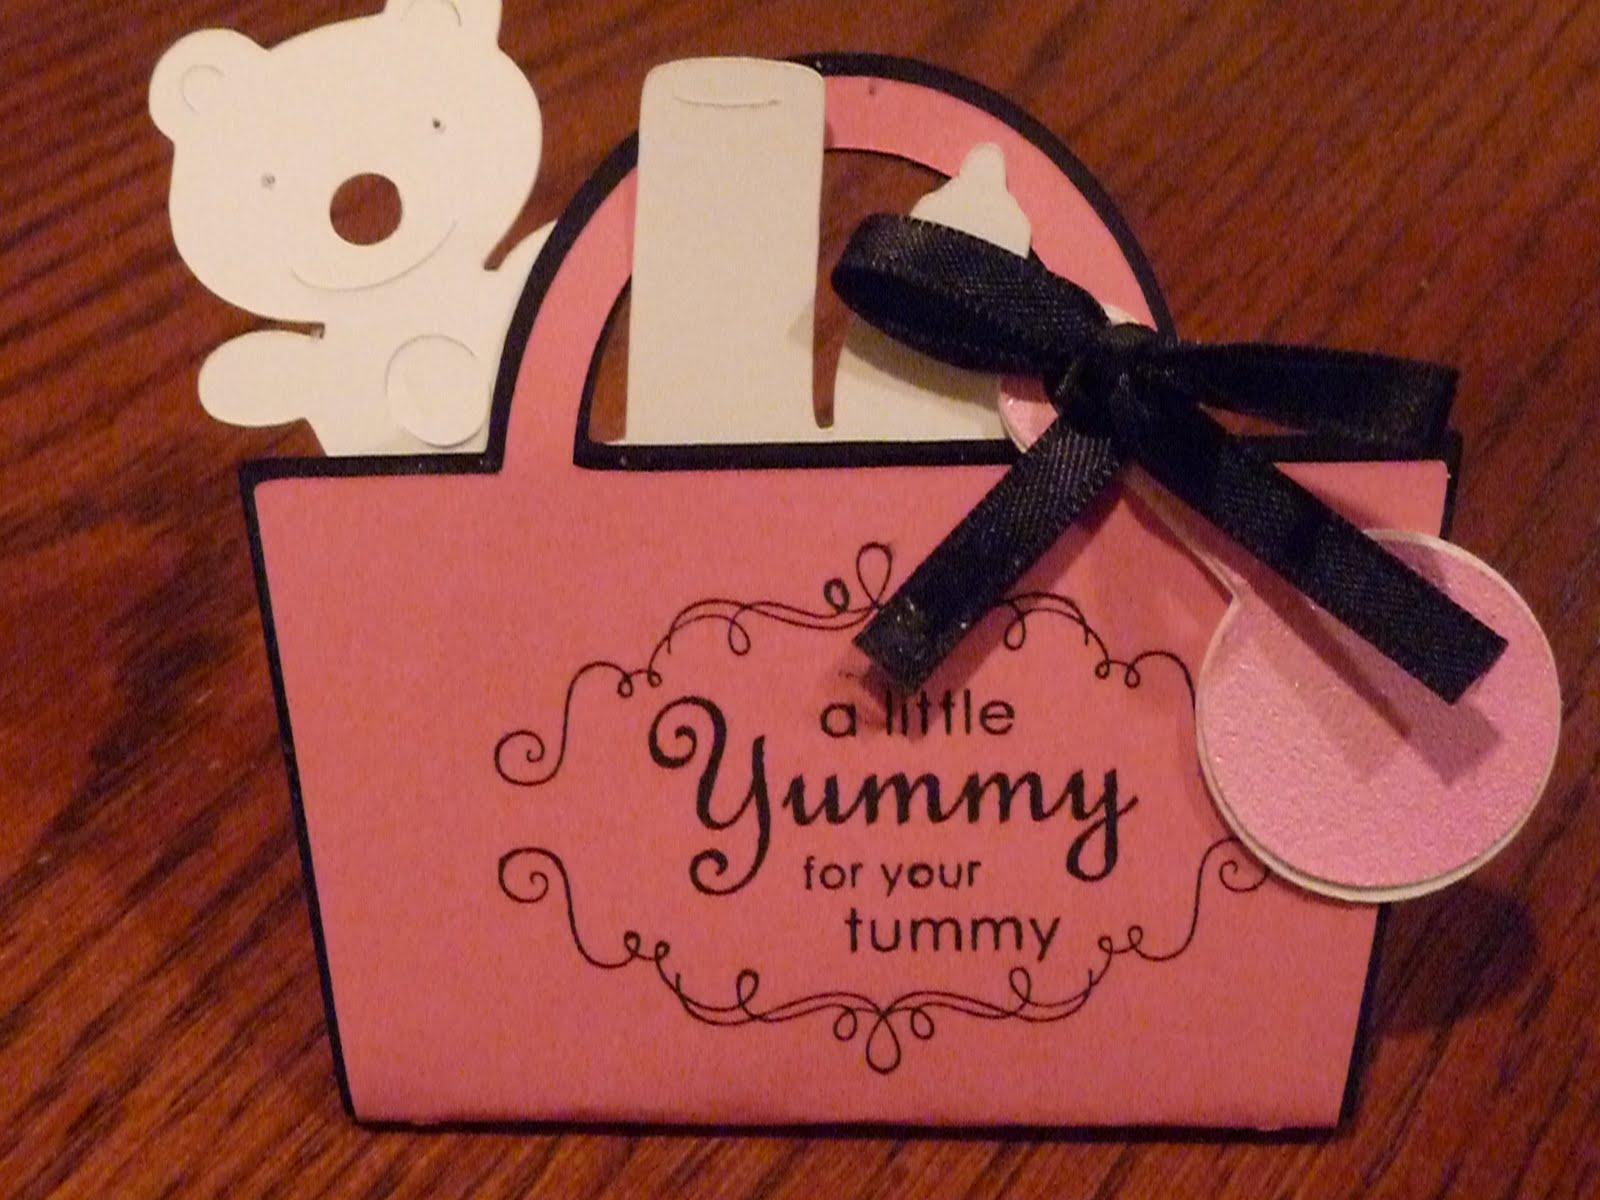 Baby Shower Favors Using Cricut ~ Cricut craftin terry diaper bag baby shower favors